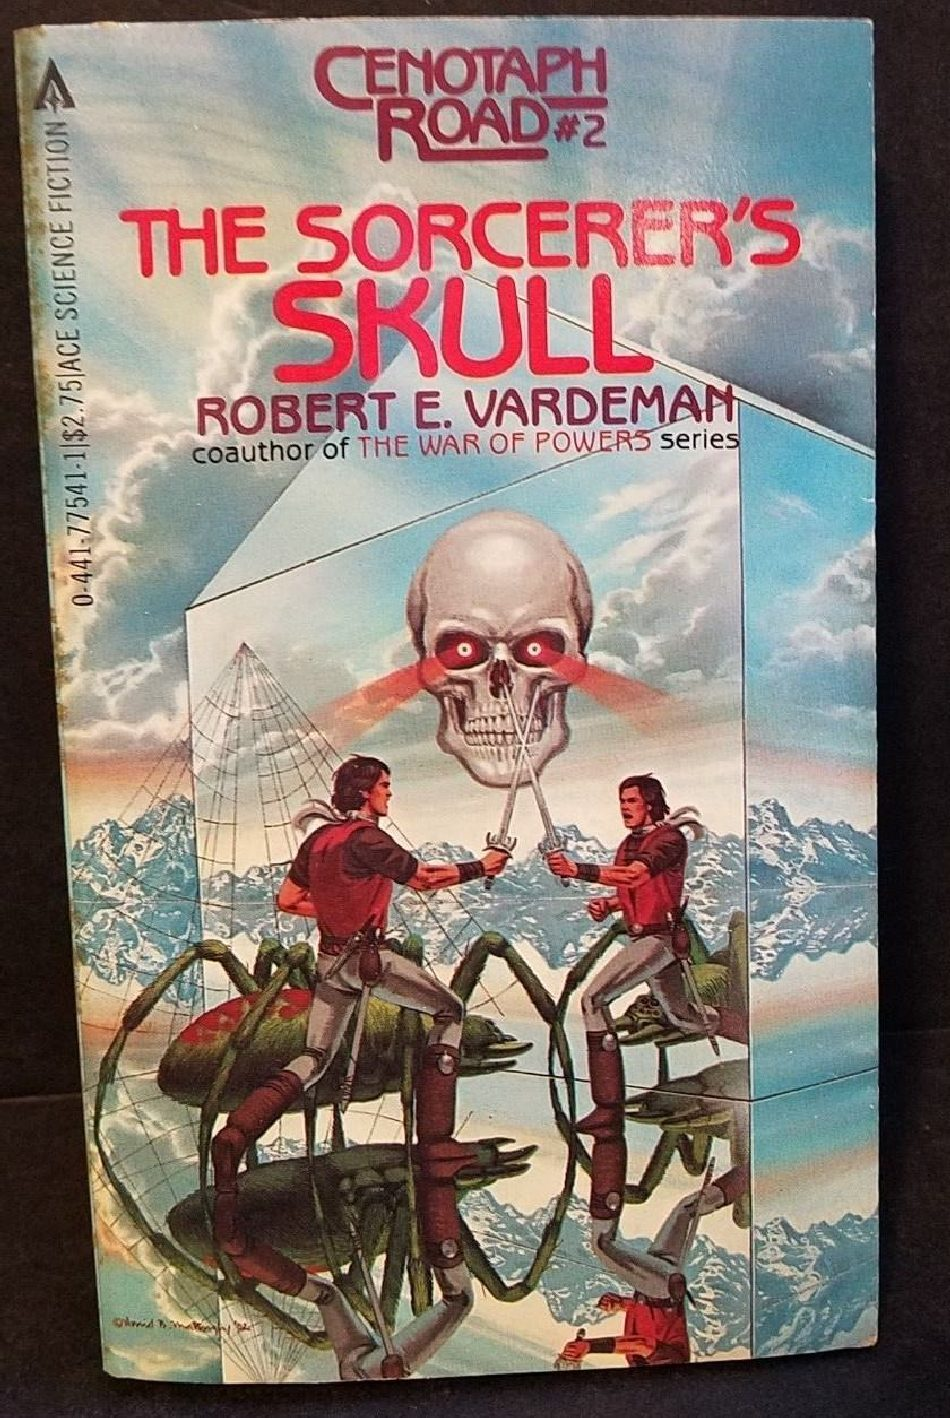 skulls-a-proppin-up-on-swords